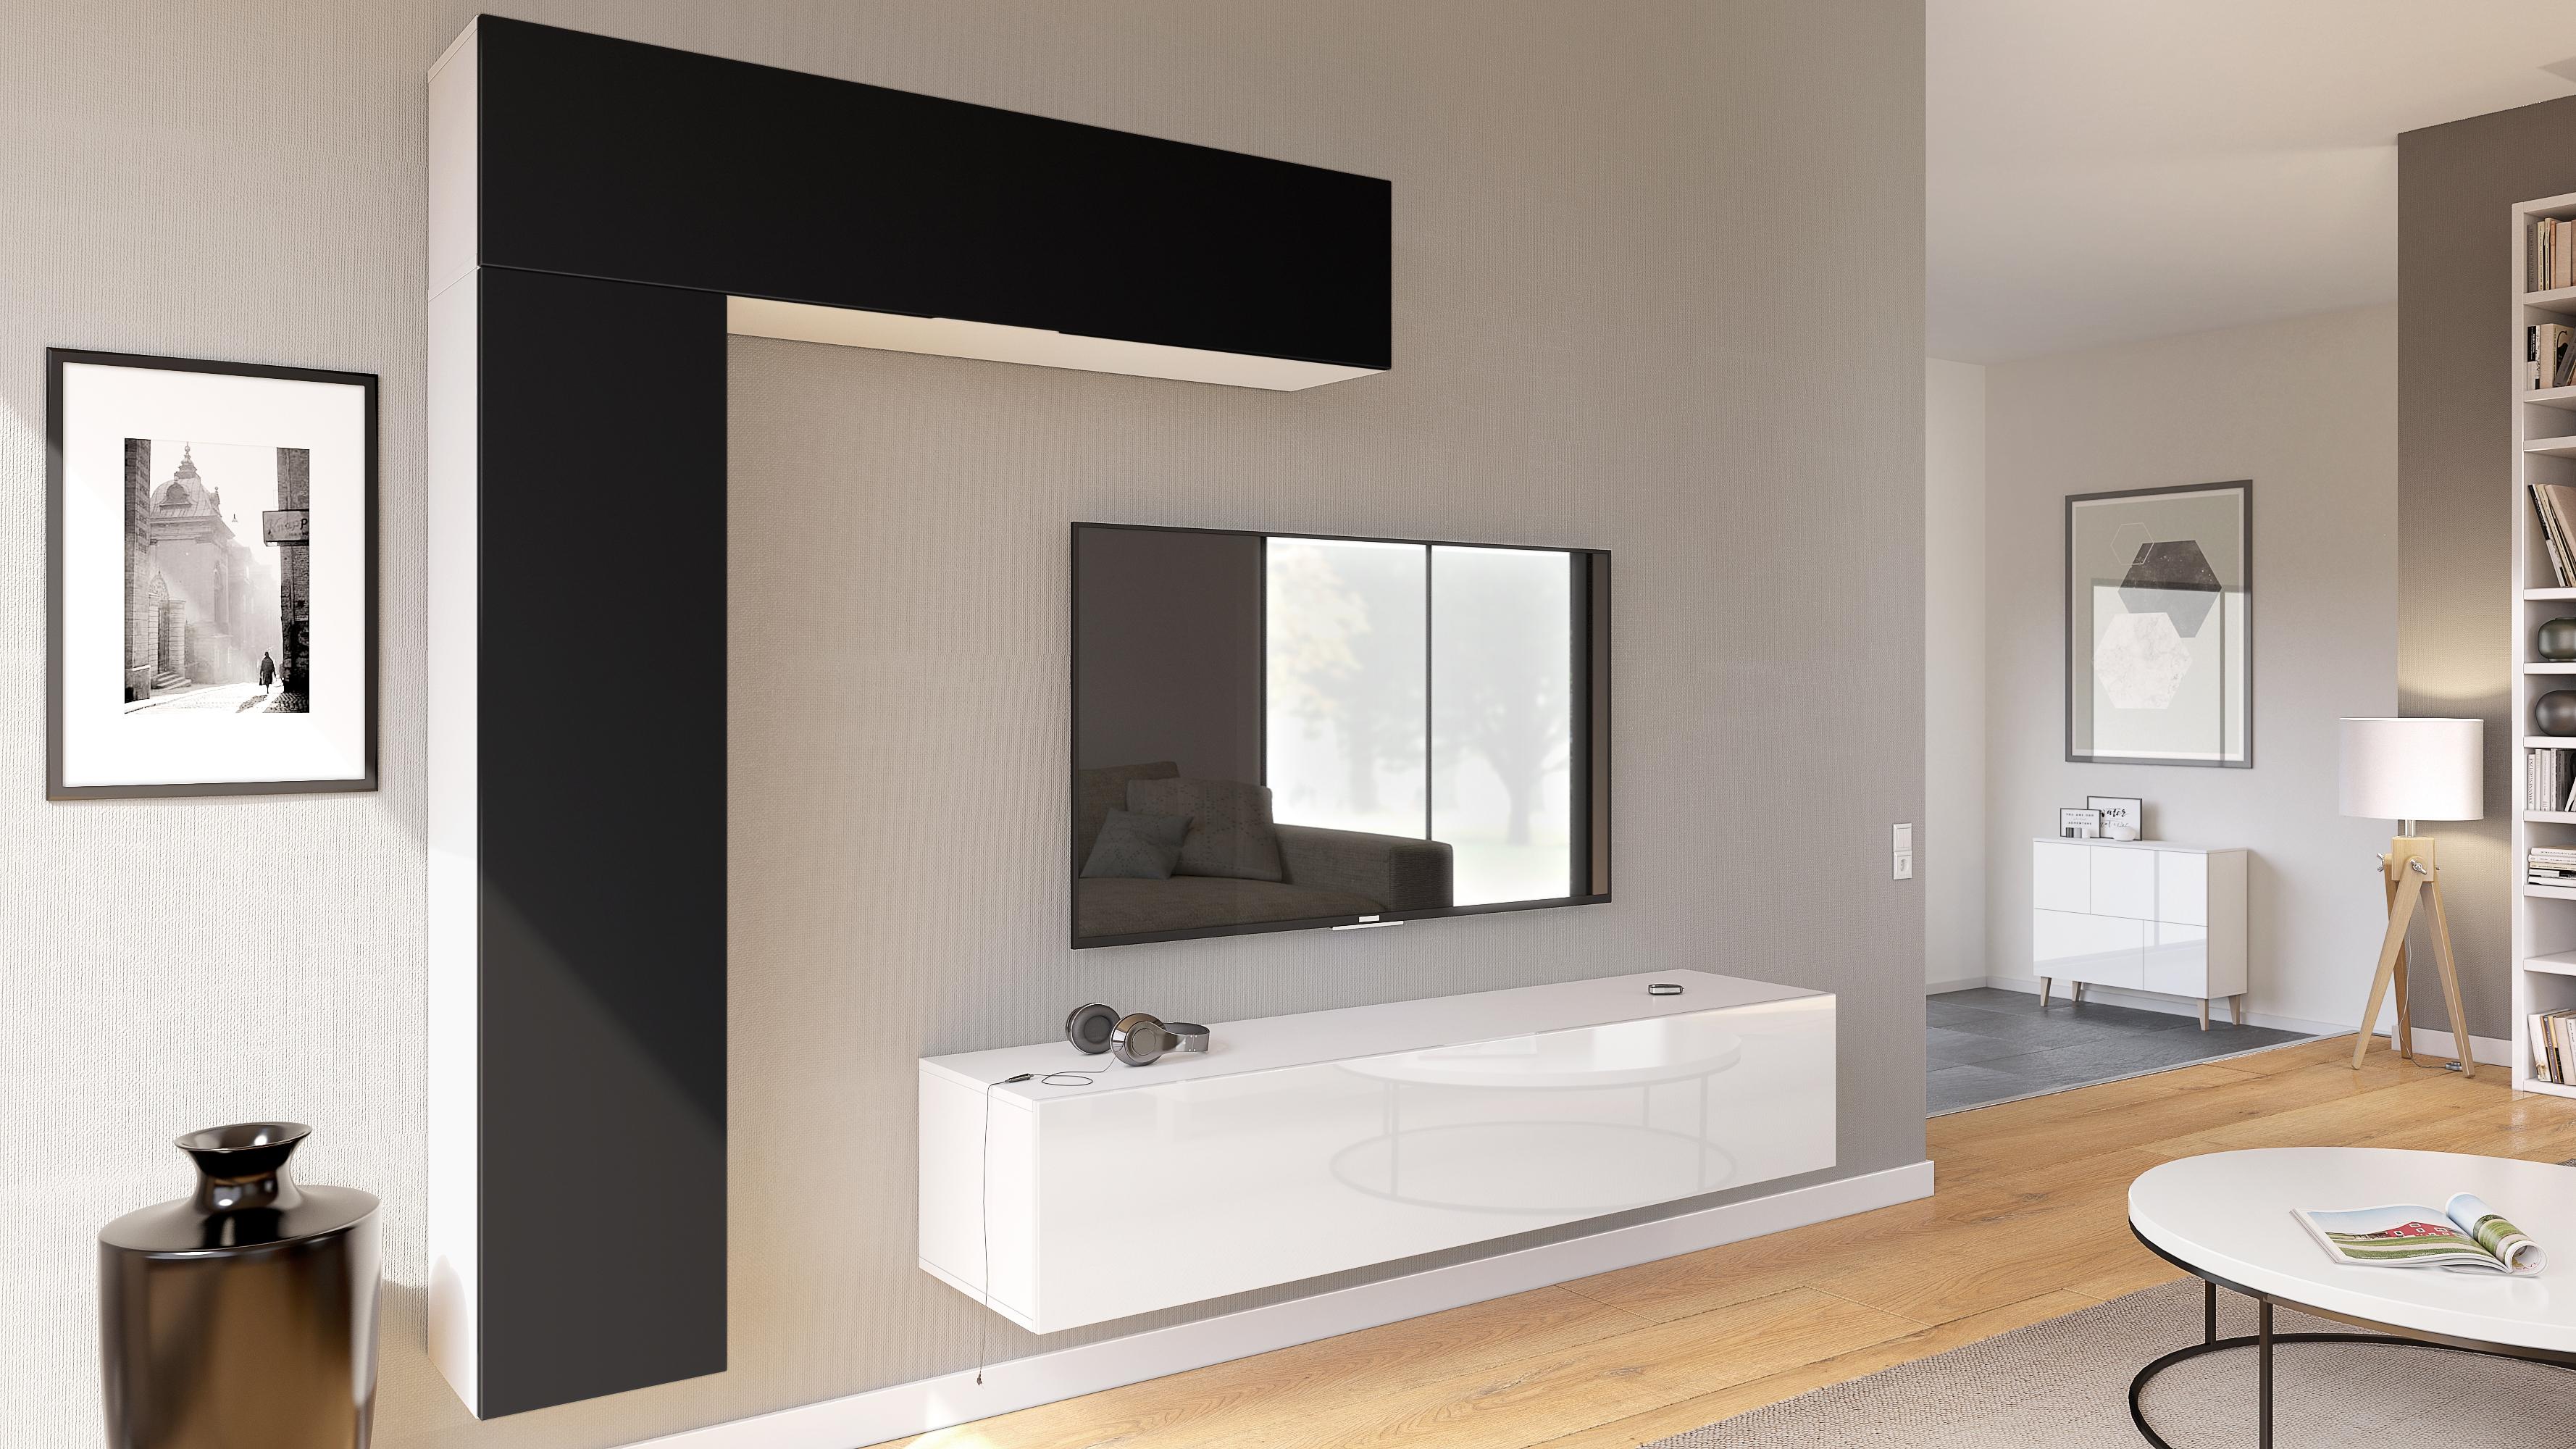 wohnwand anbauwand h ngeschrank taurito wei matt hochglanz naturdekor ebay. Black Bedroom Furniture Sets. Home Design Ideas